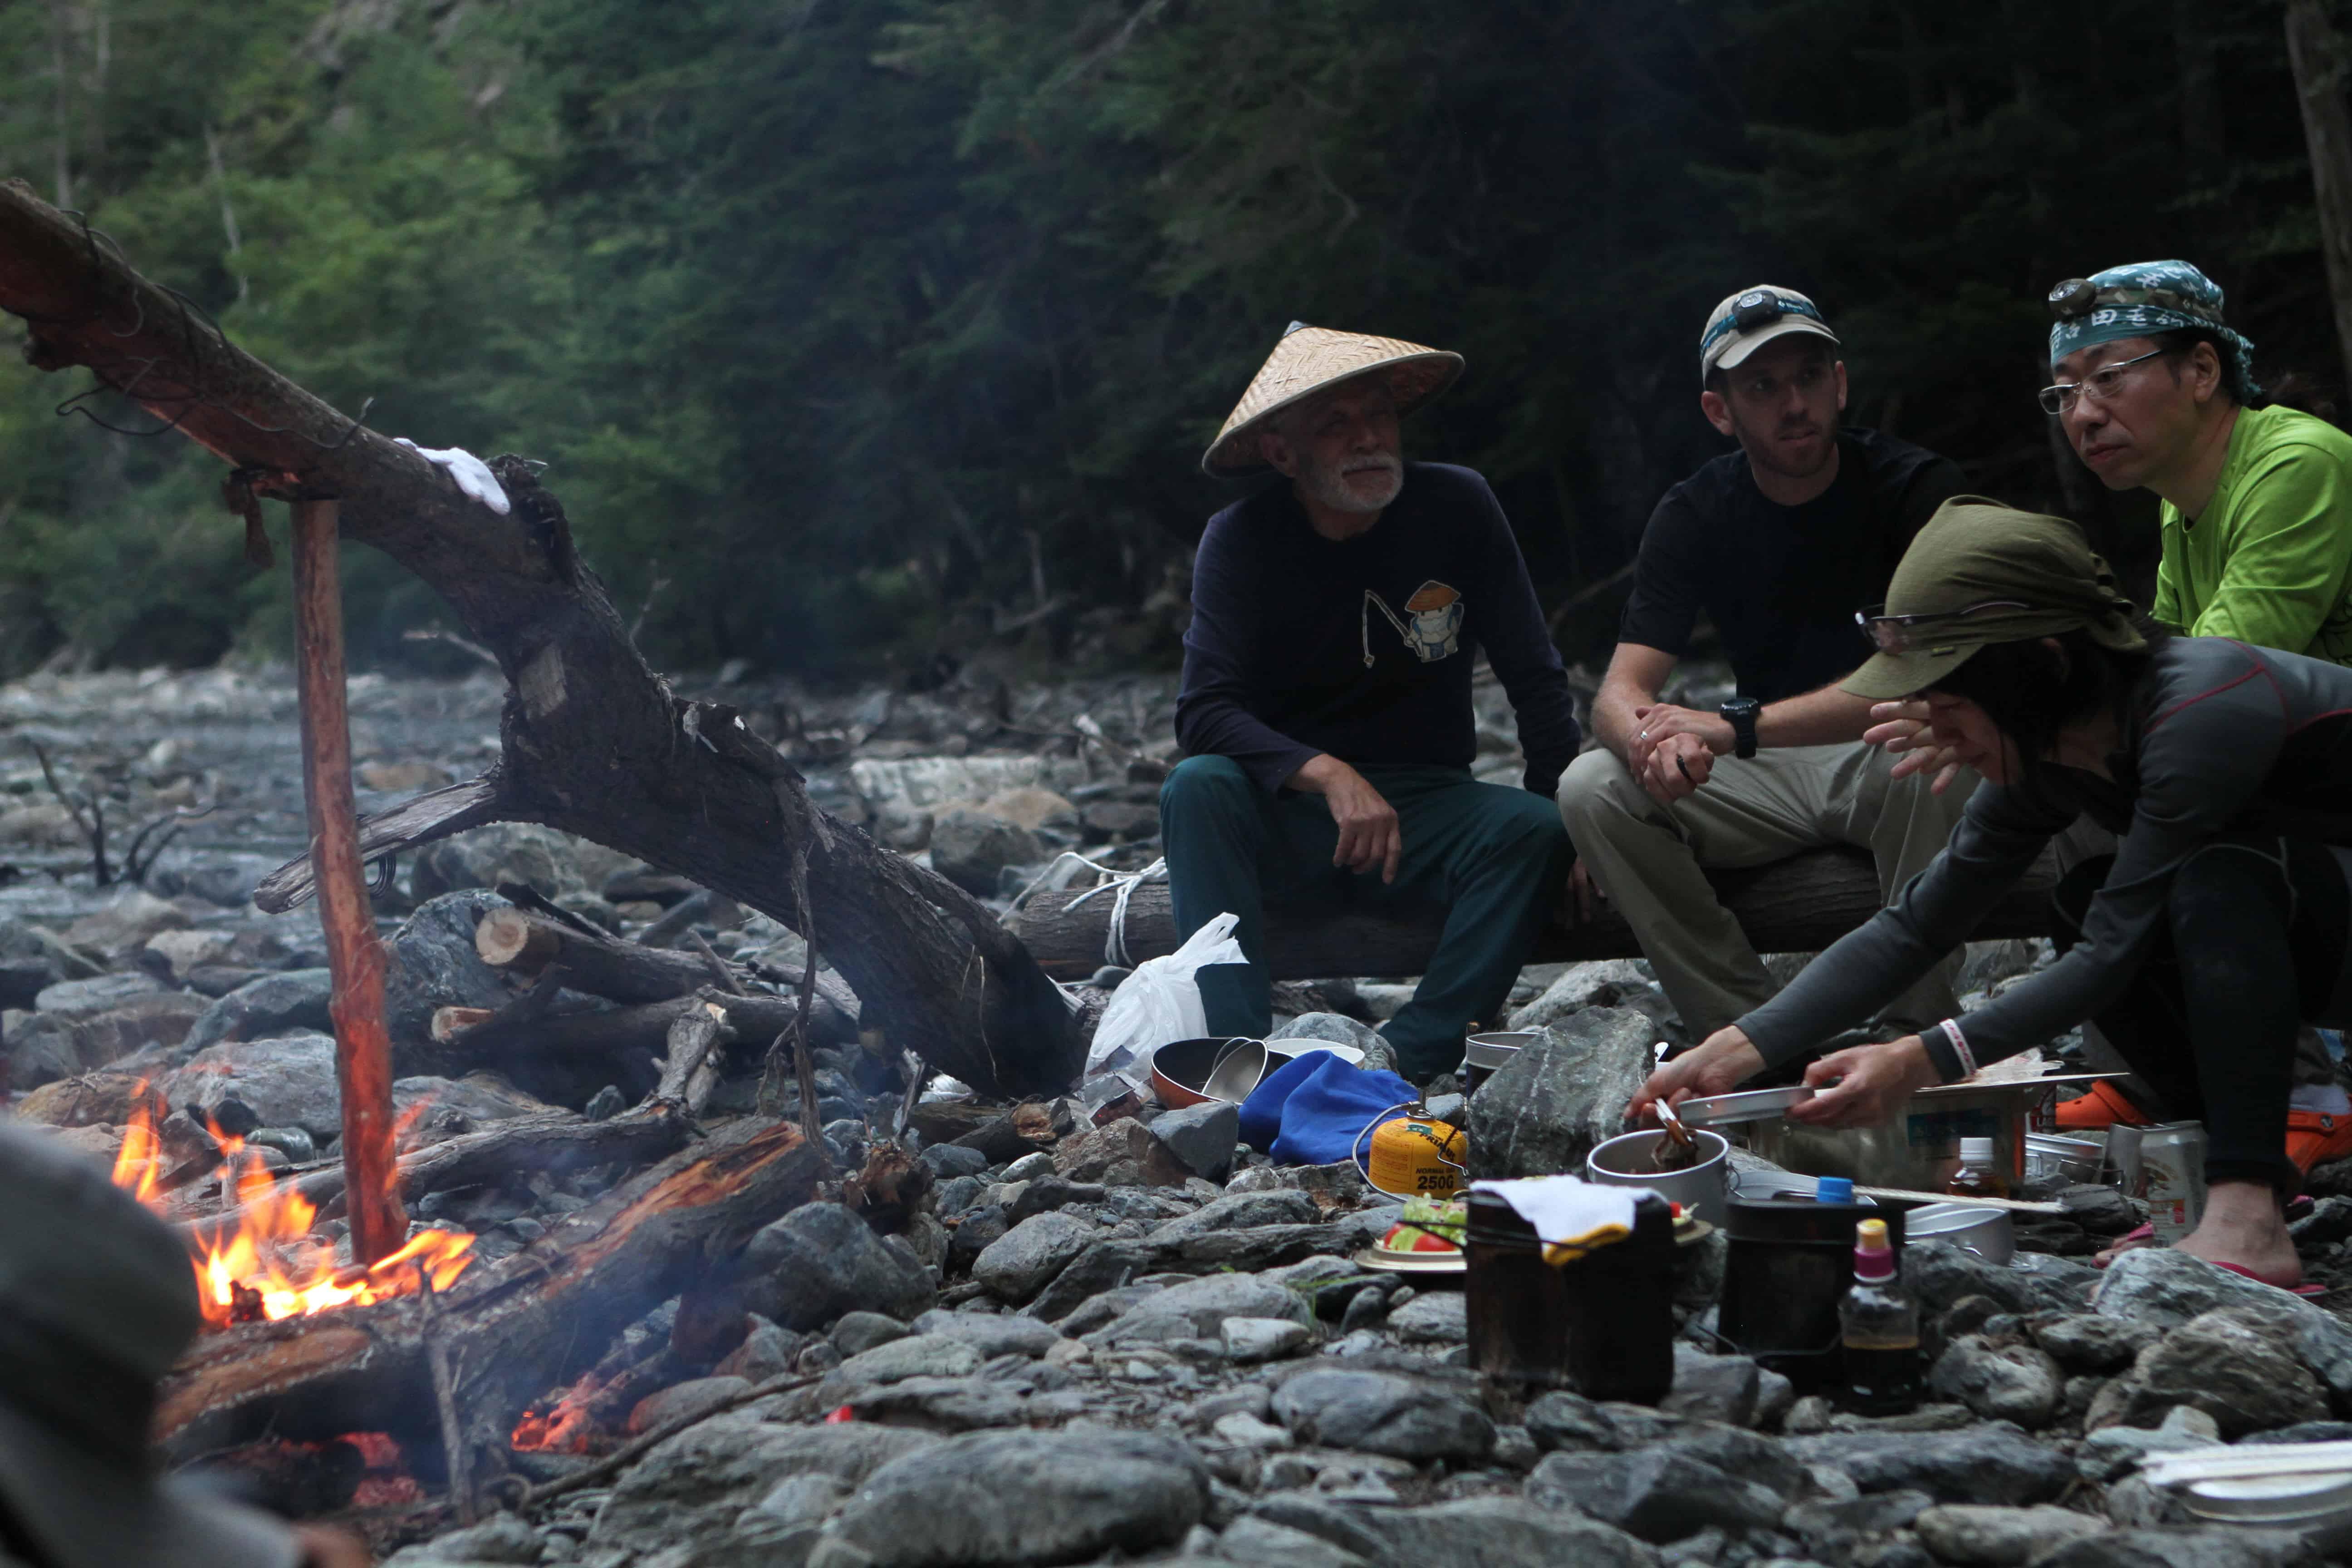 Tenkara anglers around a campfire